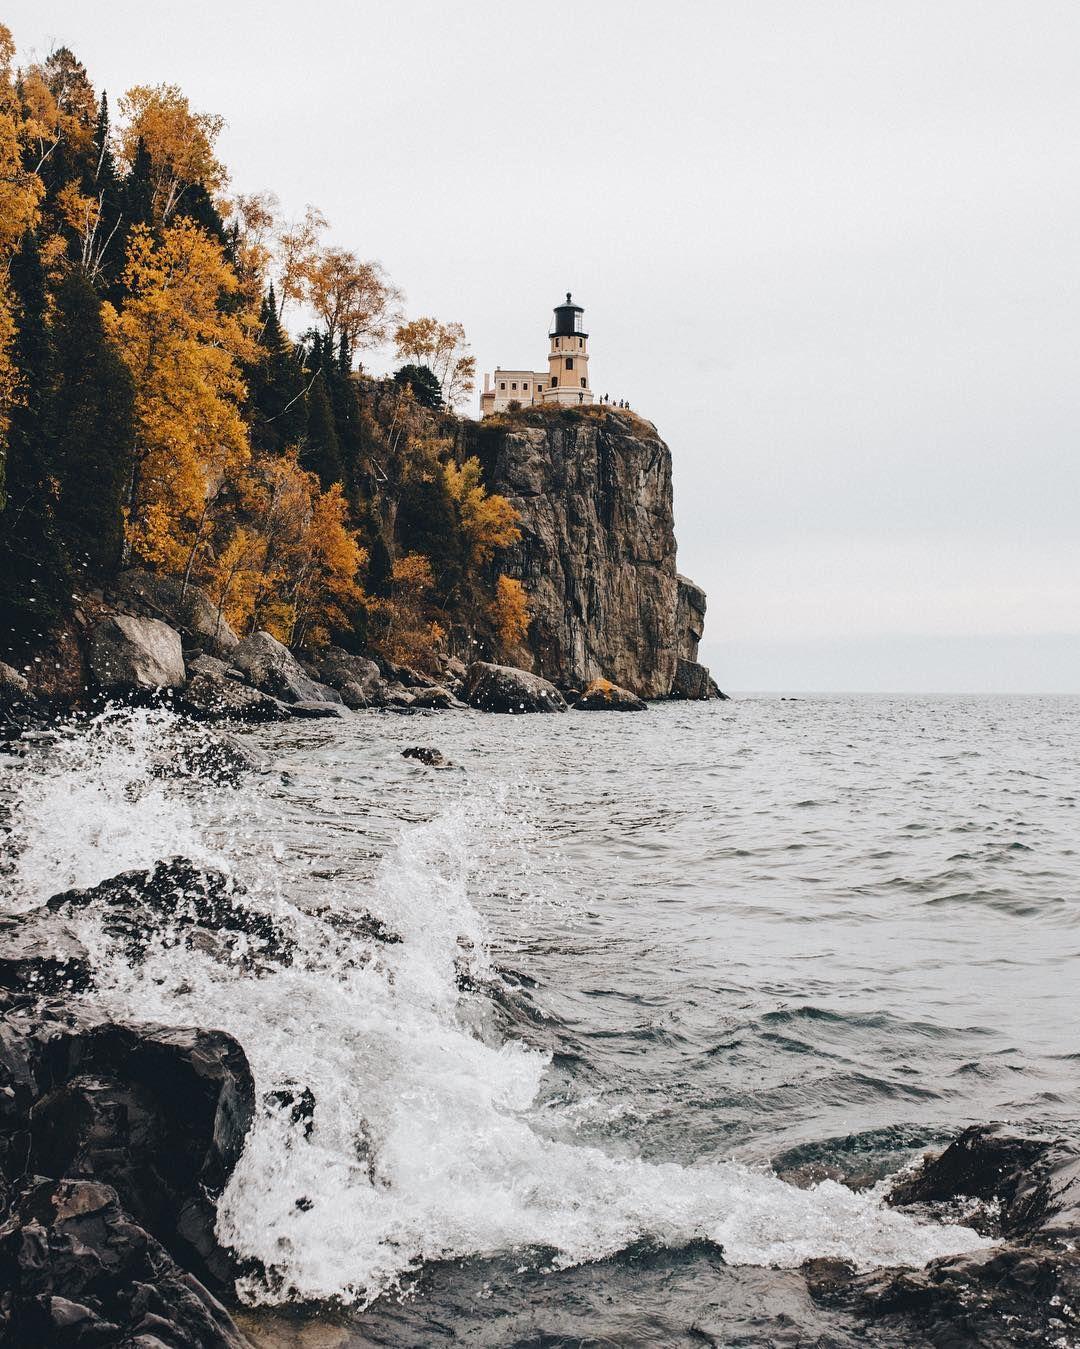 Landscape Lighting Mn: Inspo From Our Friends! Split Rock Lighthouse In Silver